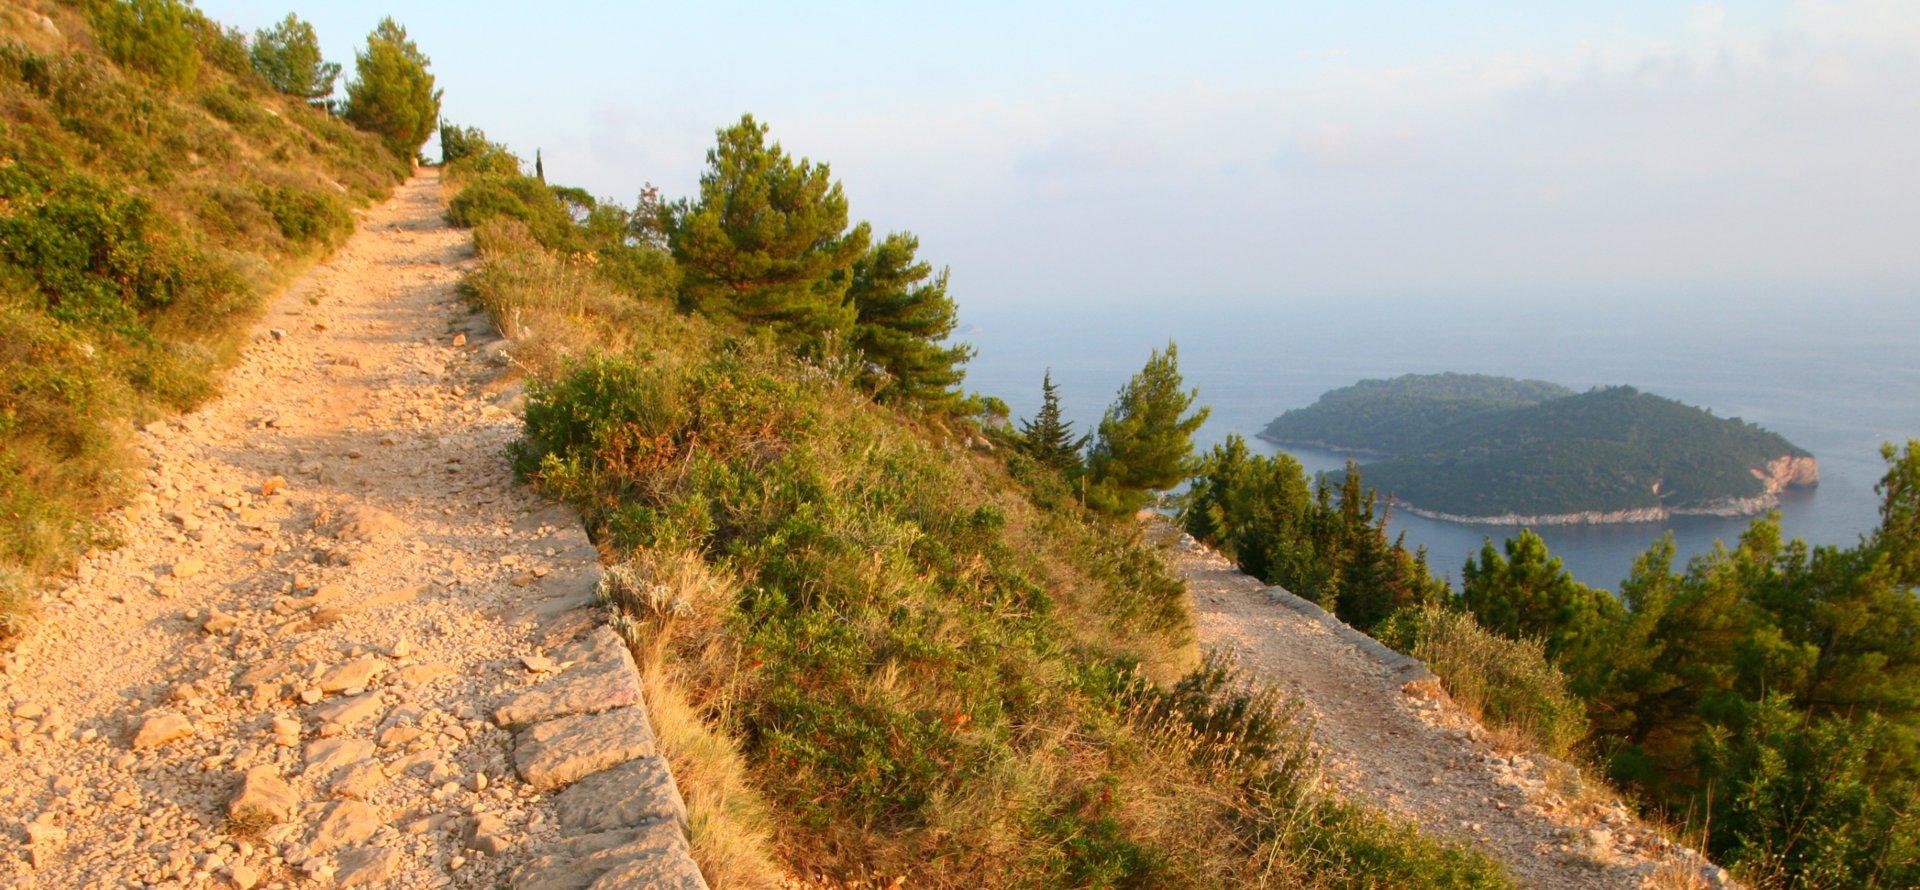 Mount Srd, Dubrovnik, Hrvatska, najlacnejšia dovolenka